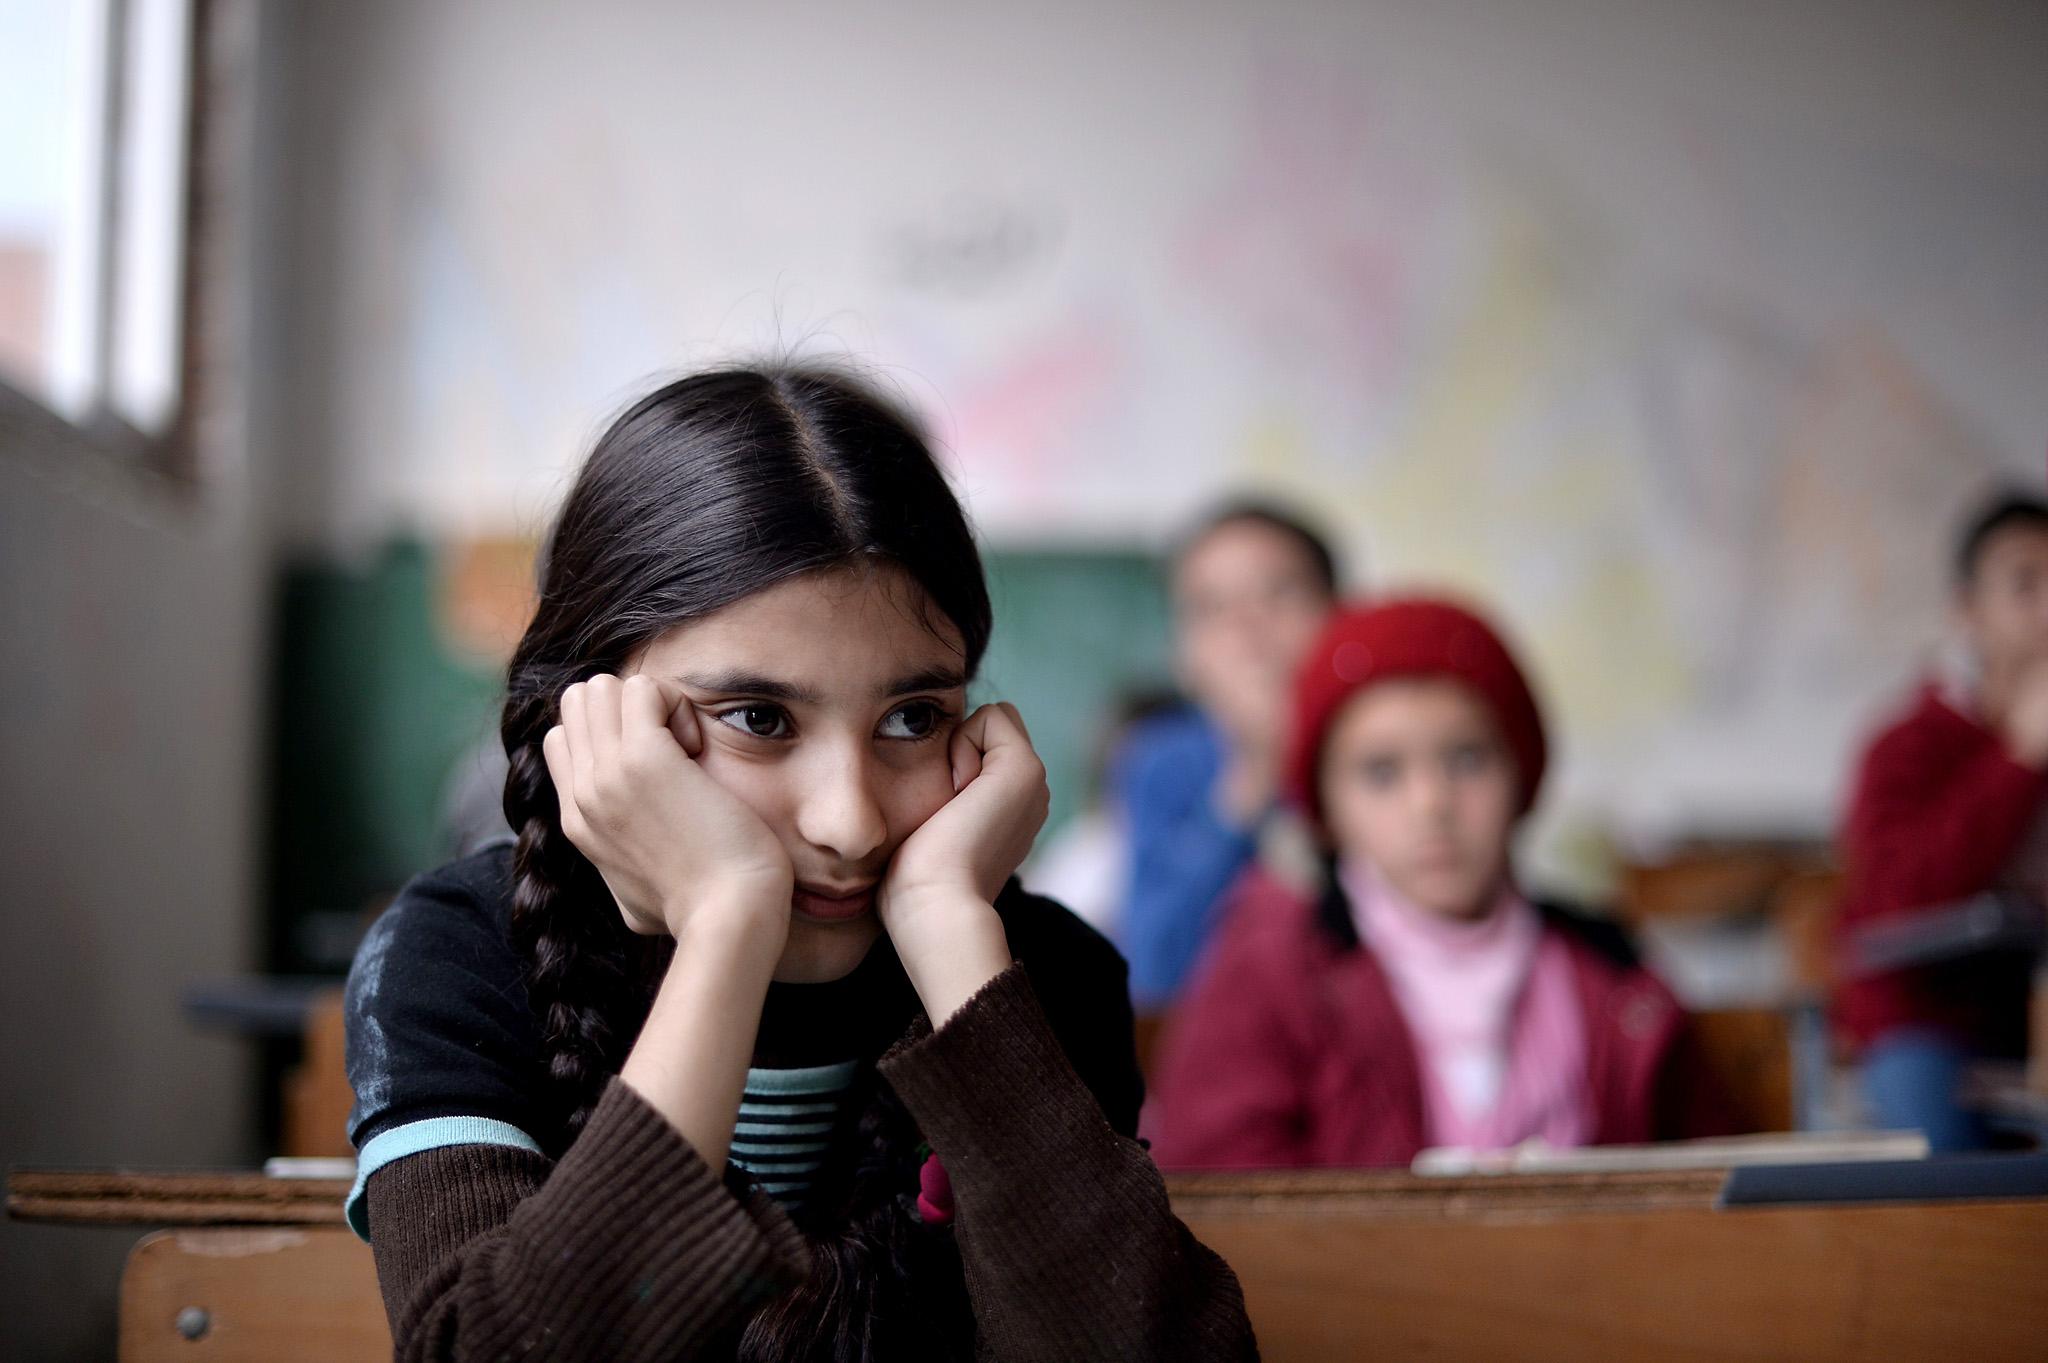 'Absurd obstacles' stop refugee children attending Bulgarian schools – report